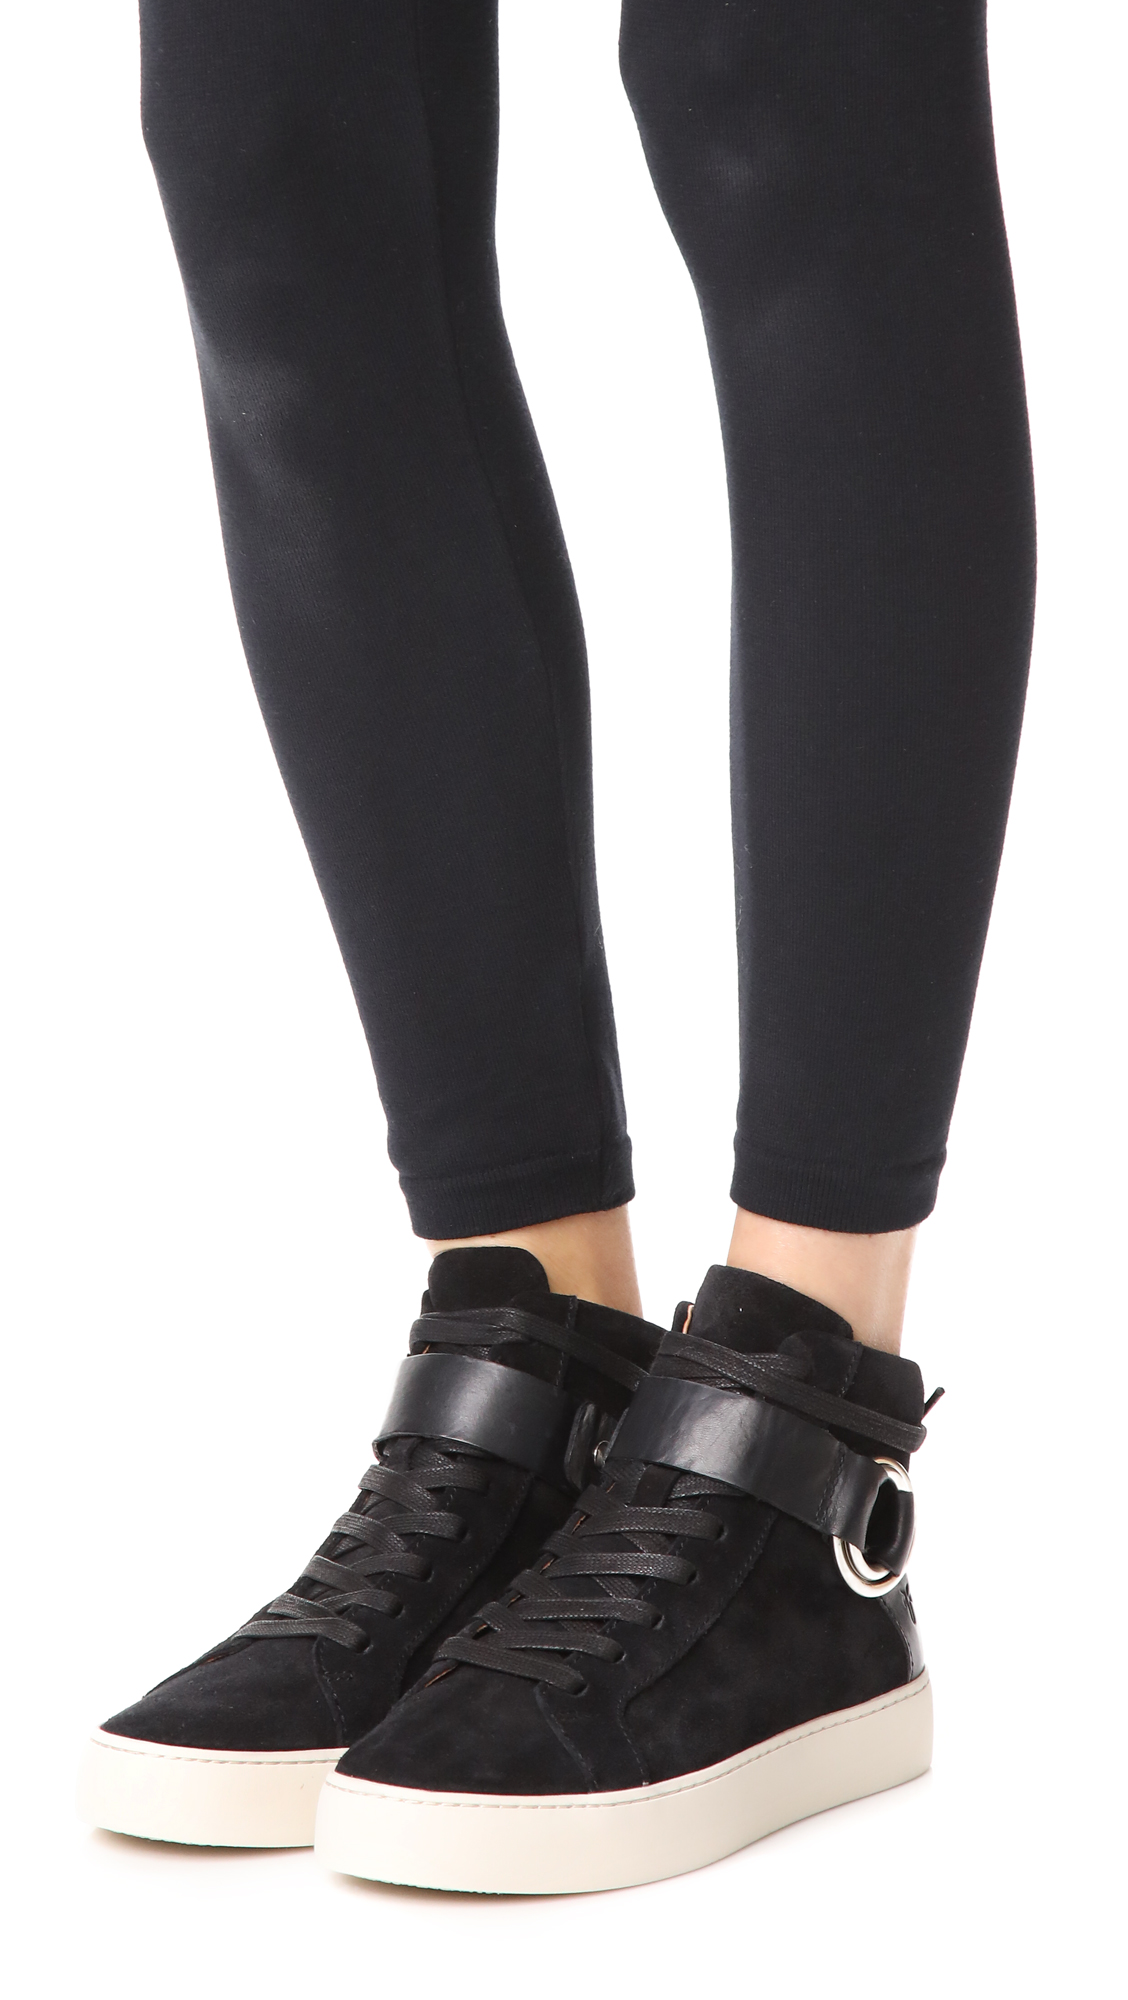 Frye Lena Harness High Sneaker q9kDs54IpY